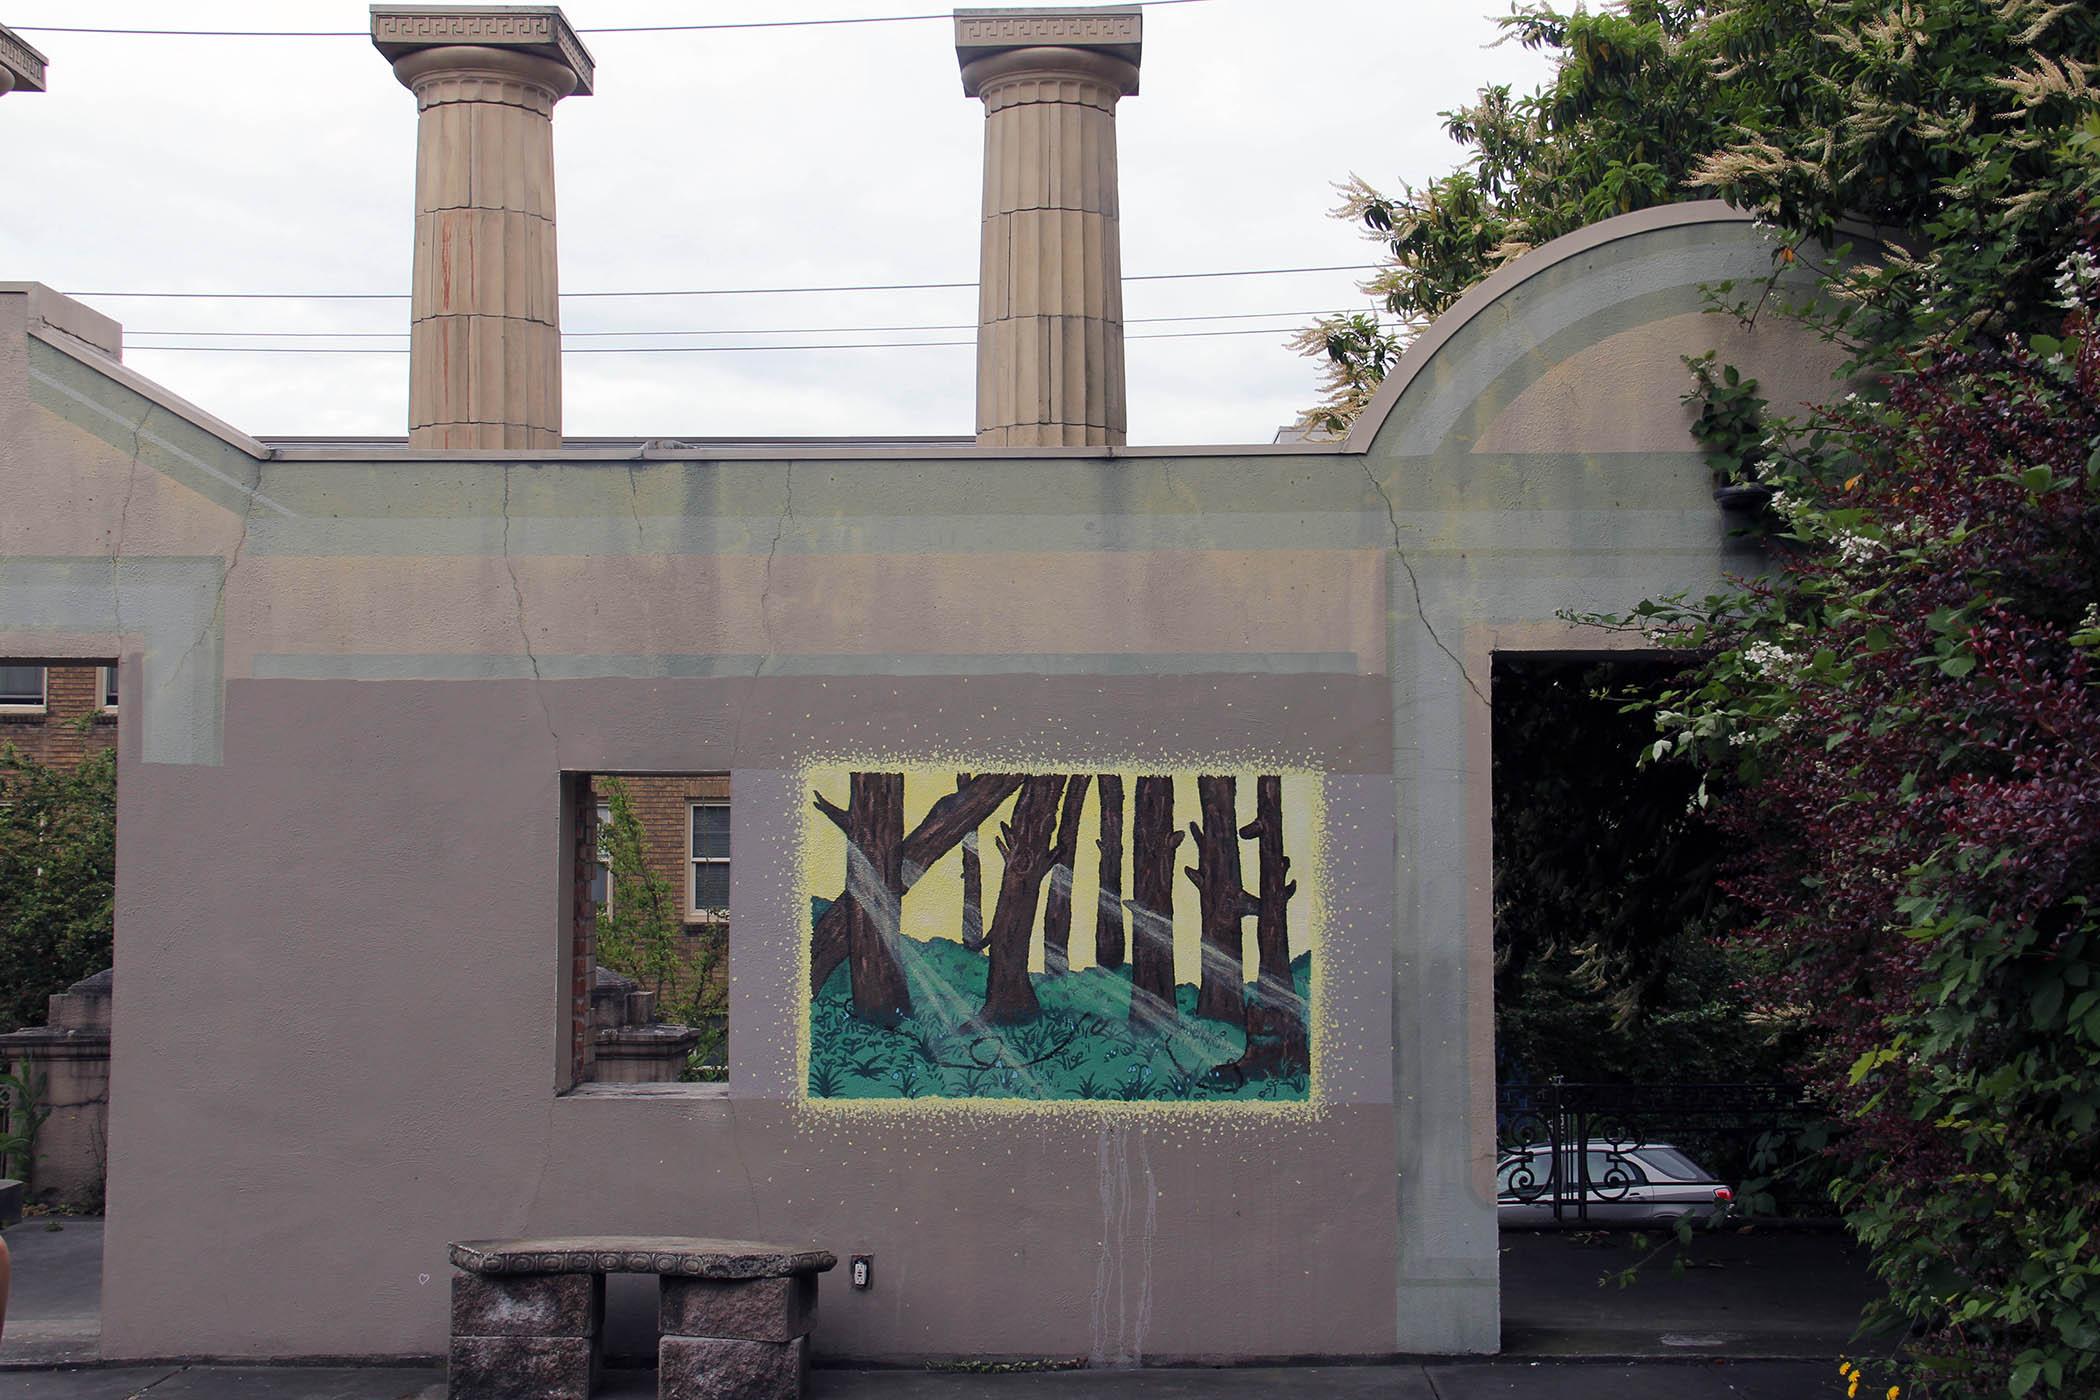 Templedehirschhero